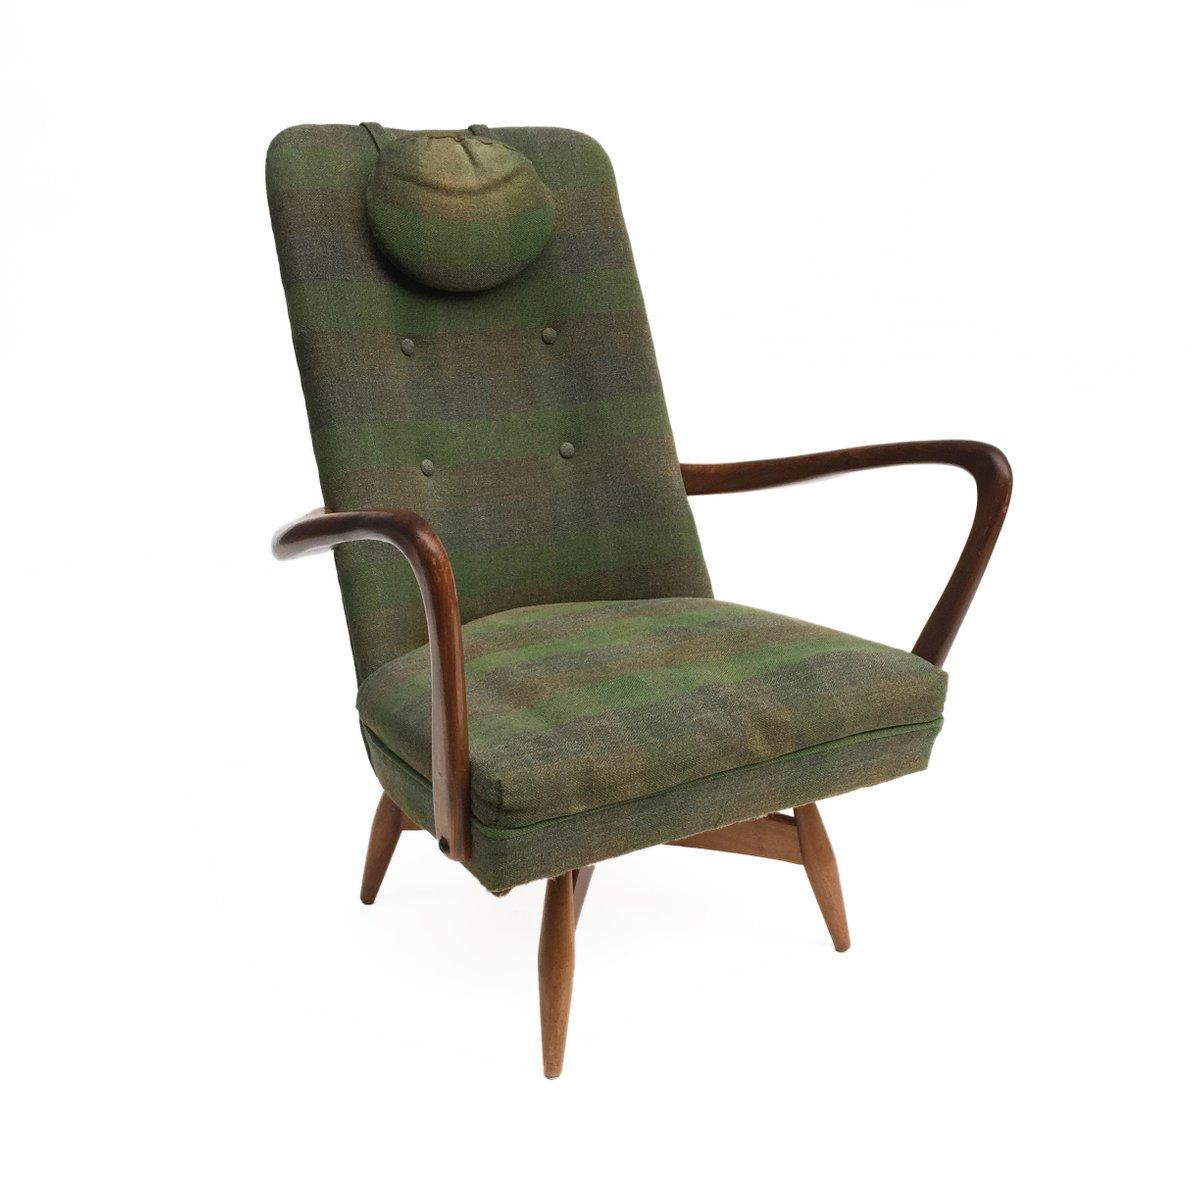 swivel chair mid century logo design danish 1950s for sale at pamono